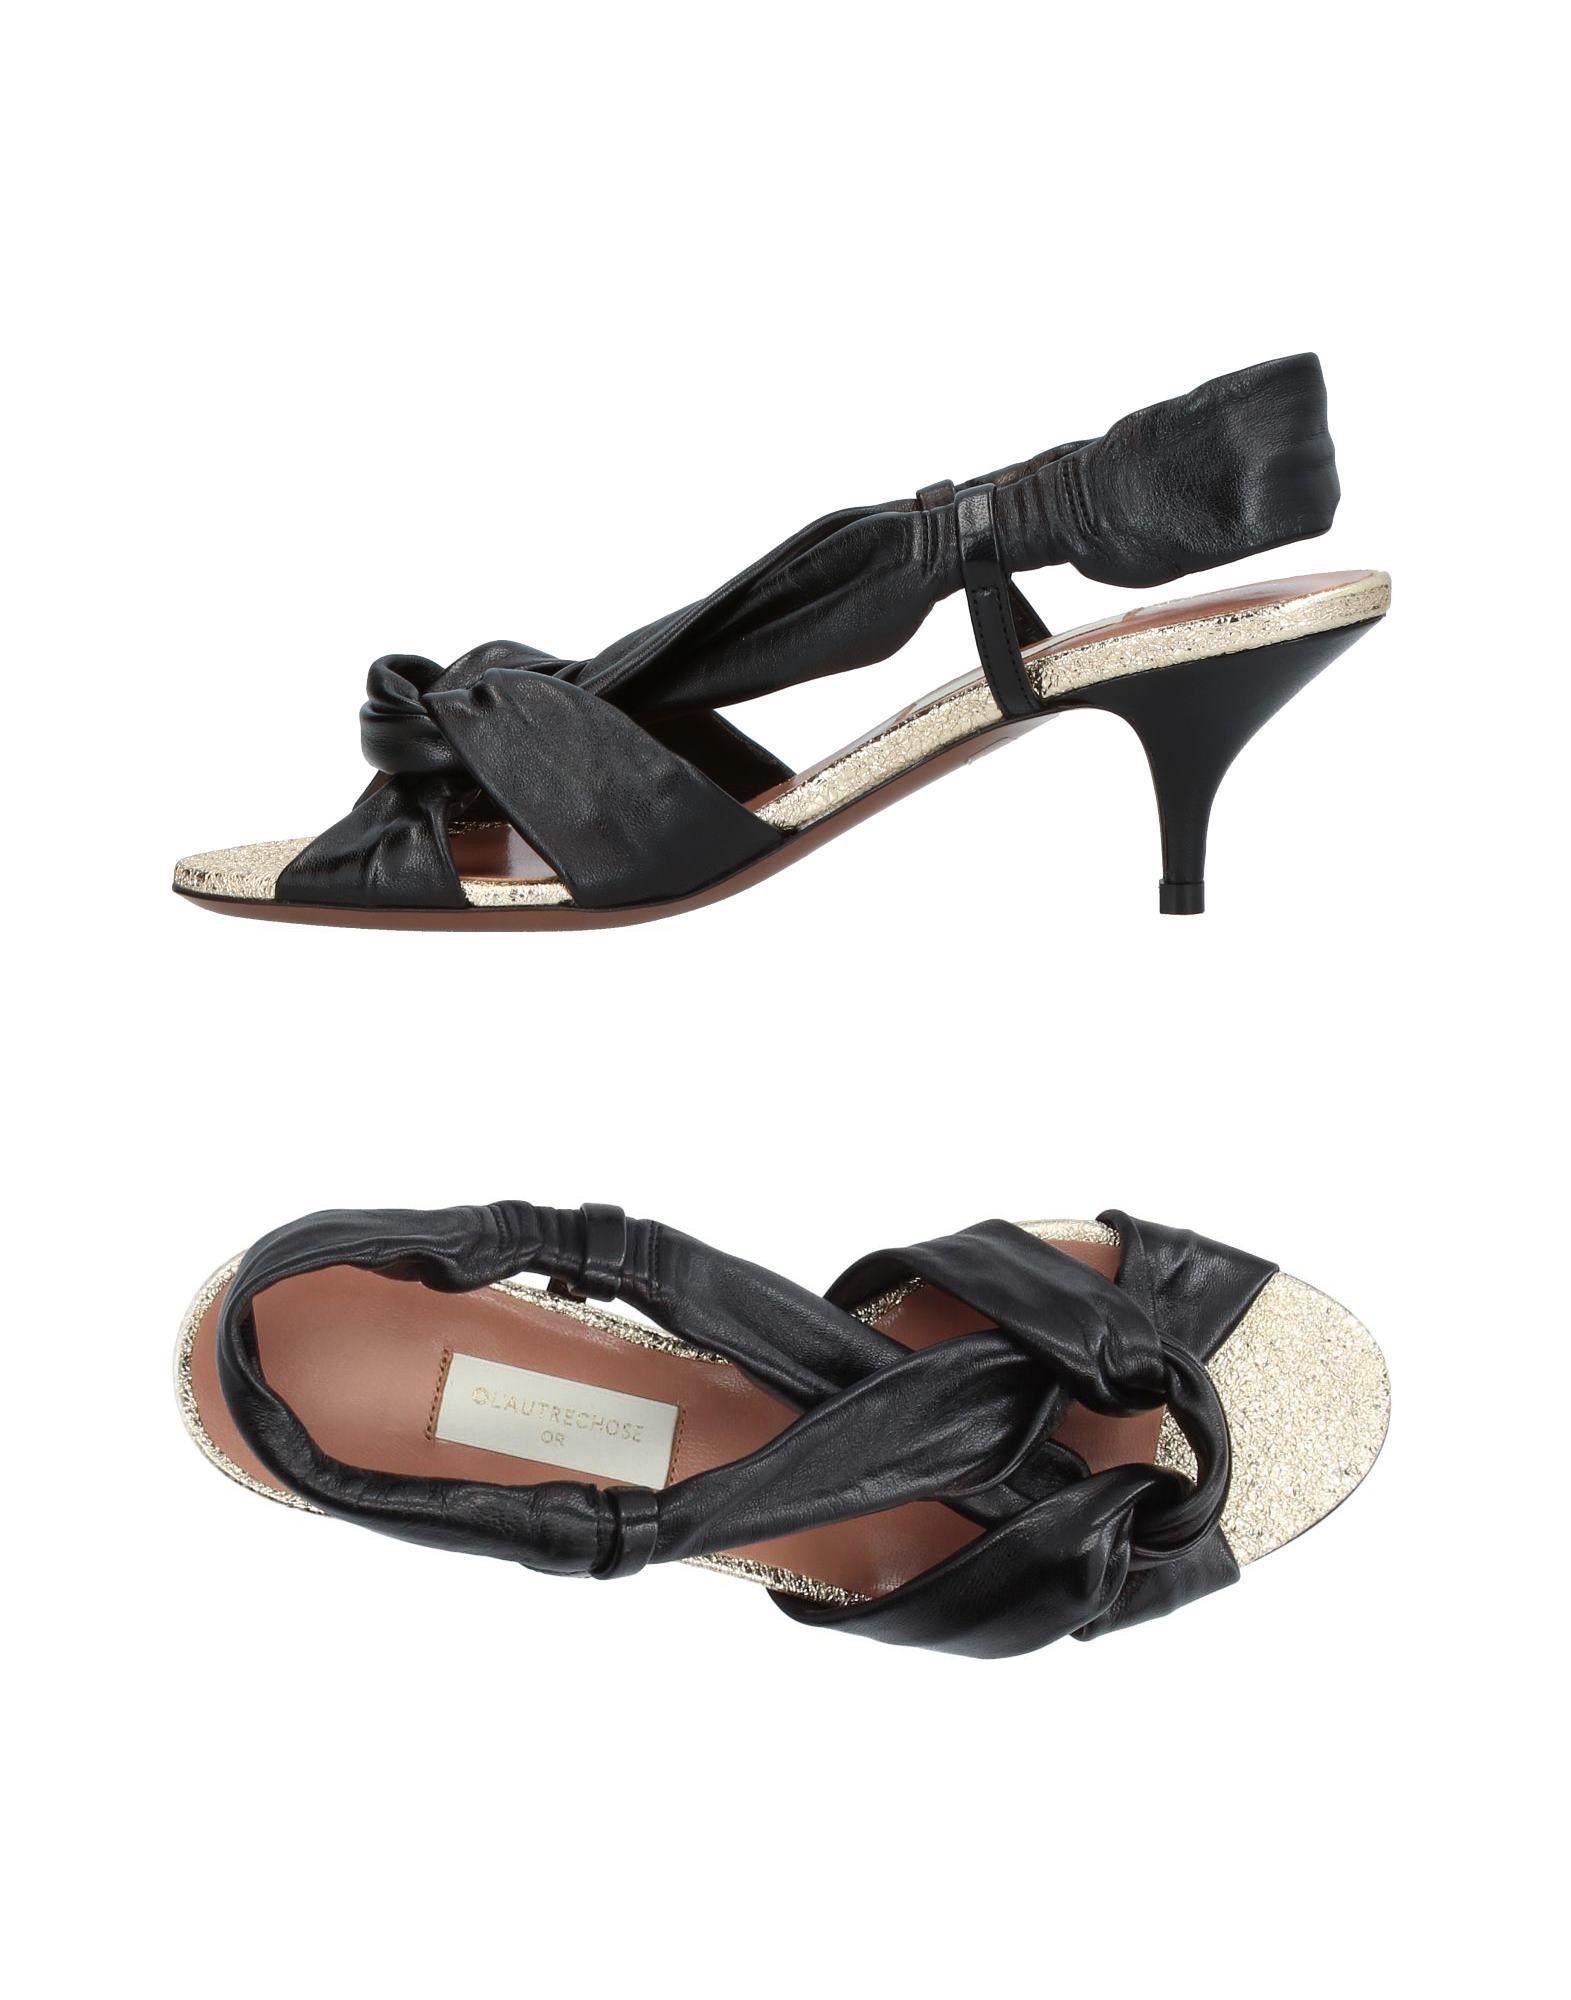 L' Chose Autre Chose L' Sandalen Damen  11381016ML Neue Schuhe 8756b6